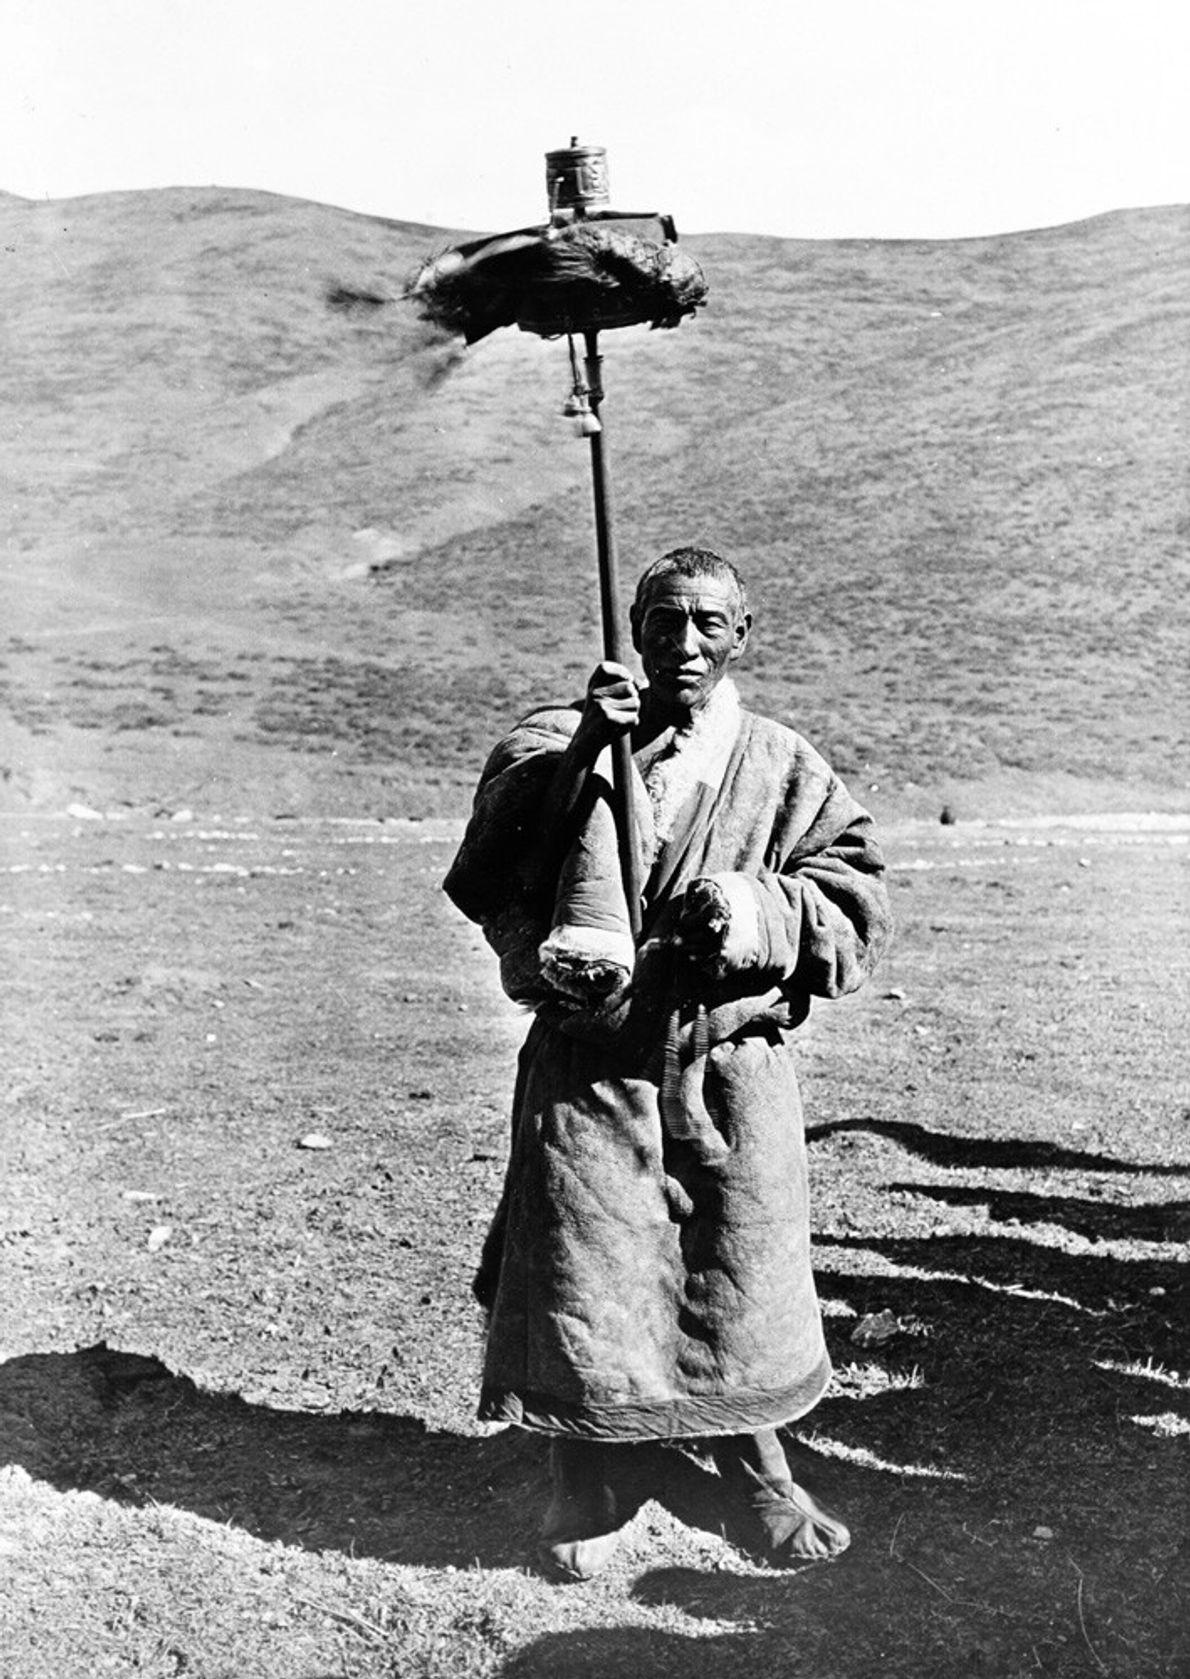 Tibet, 1955: A Tibetan Drokpa nomad twirls a huge prayer wheel along the route between Choni and Xincheng. 'Drokpa' ...